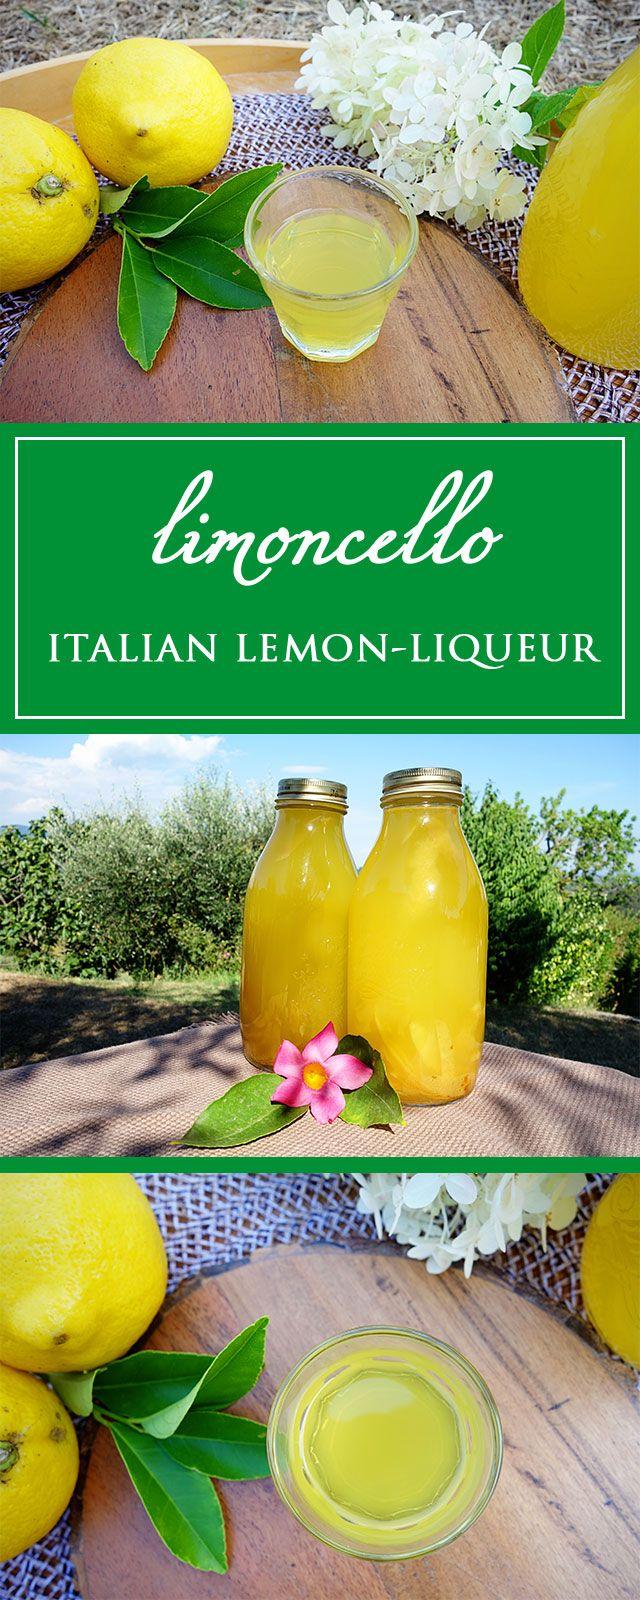 Limoncello - a simple, delicious and beautiful lemony recipe for the famous italian lemon liqueur! 🍋😋🇮🇹   cucina-con-amore.com